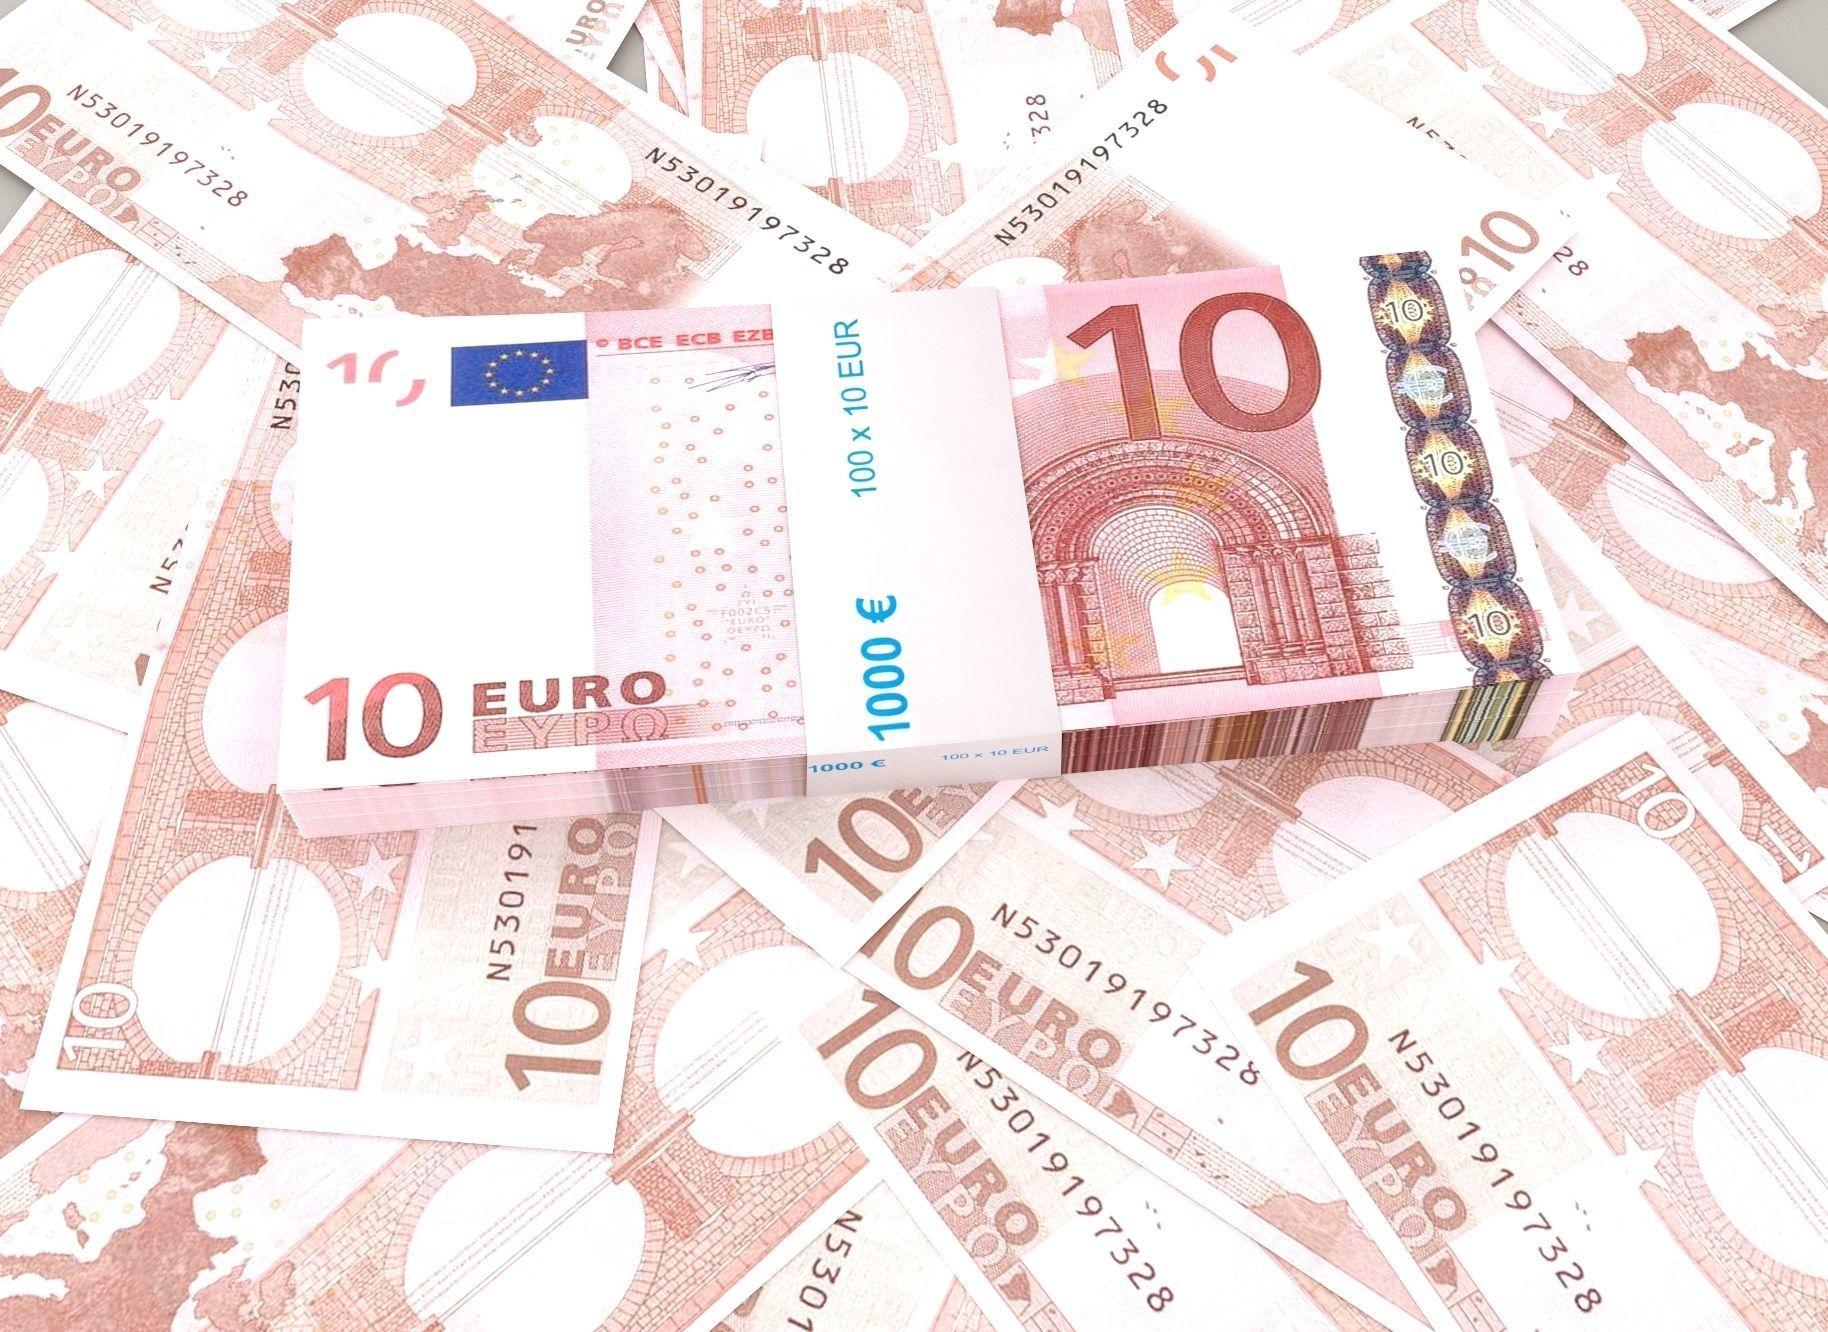 10 euro banknote packs